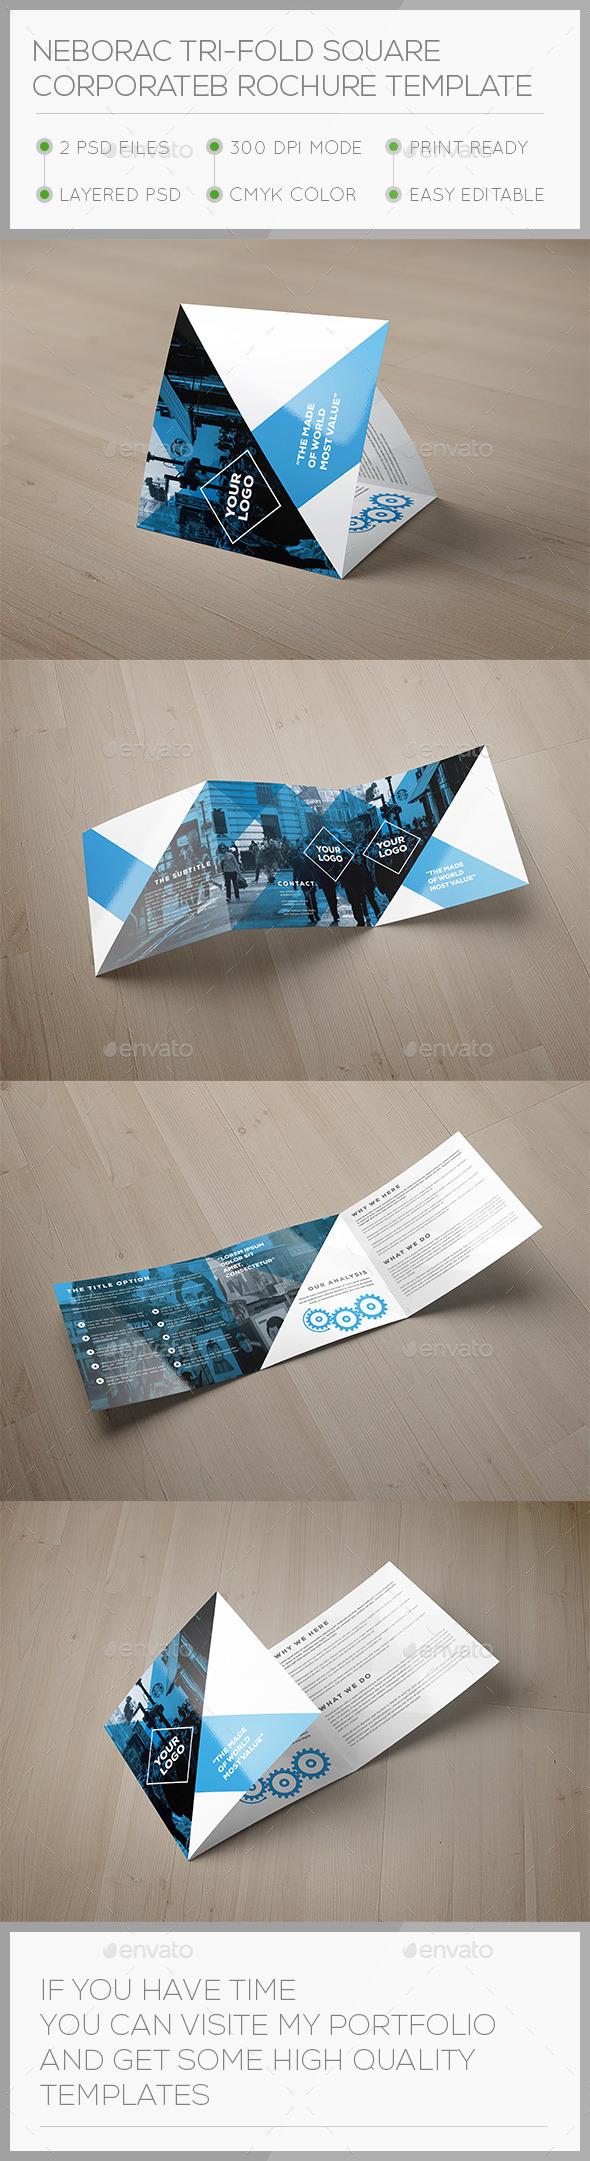 Nerorac Tri-fold Square Brochure Template - Brochures Print Templates